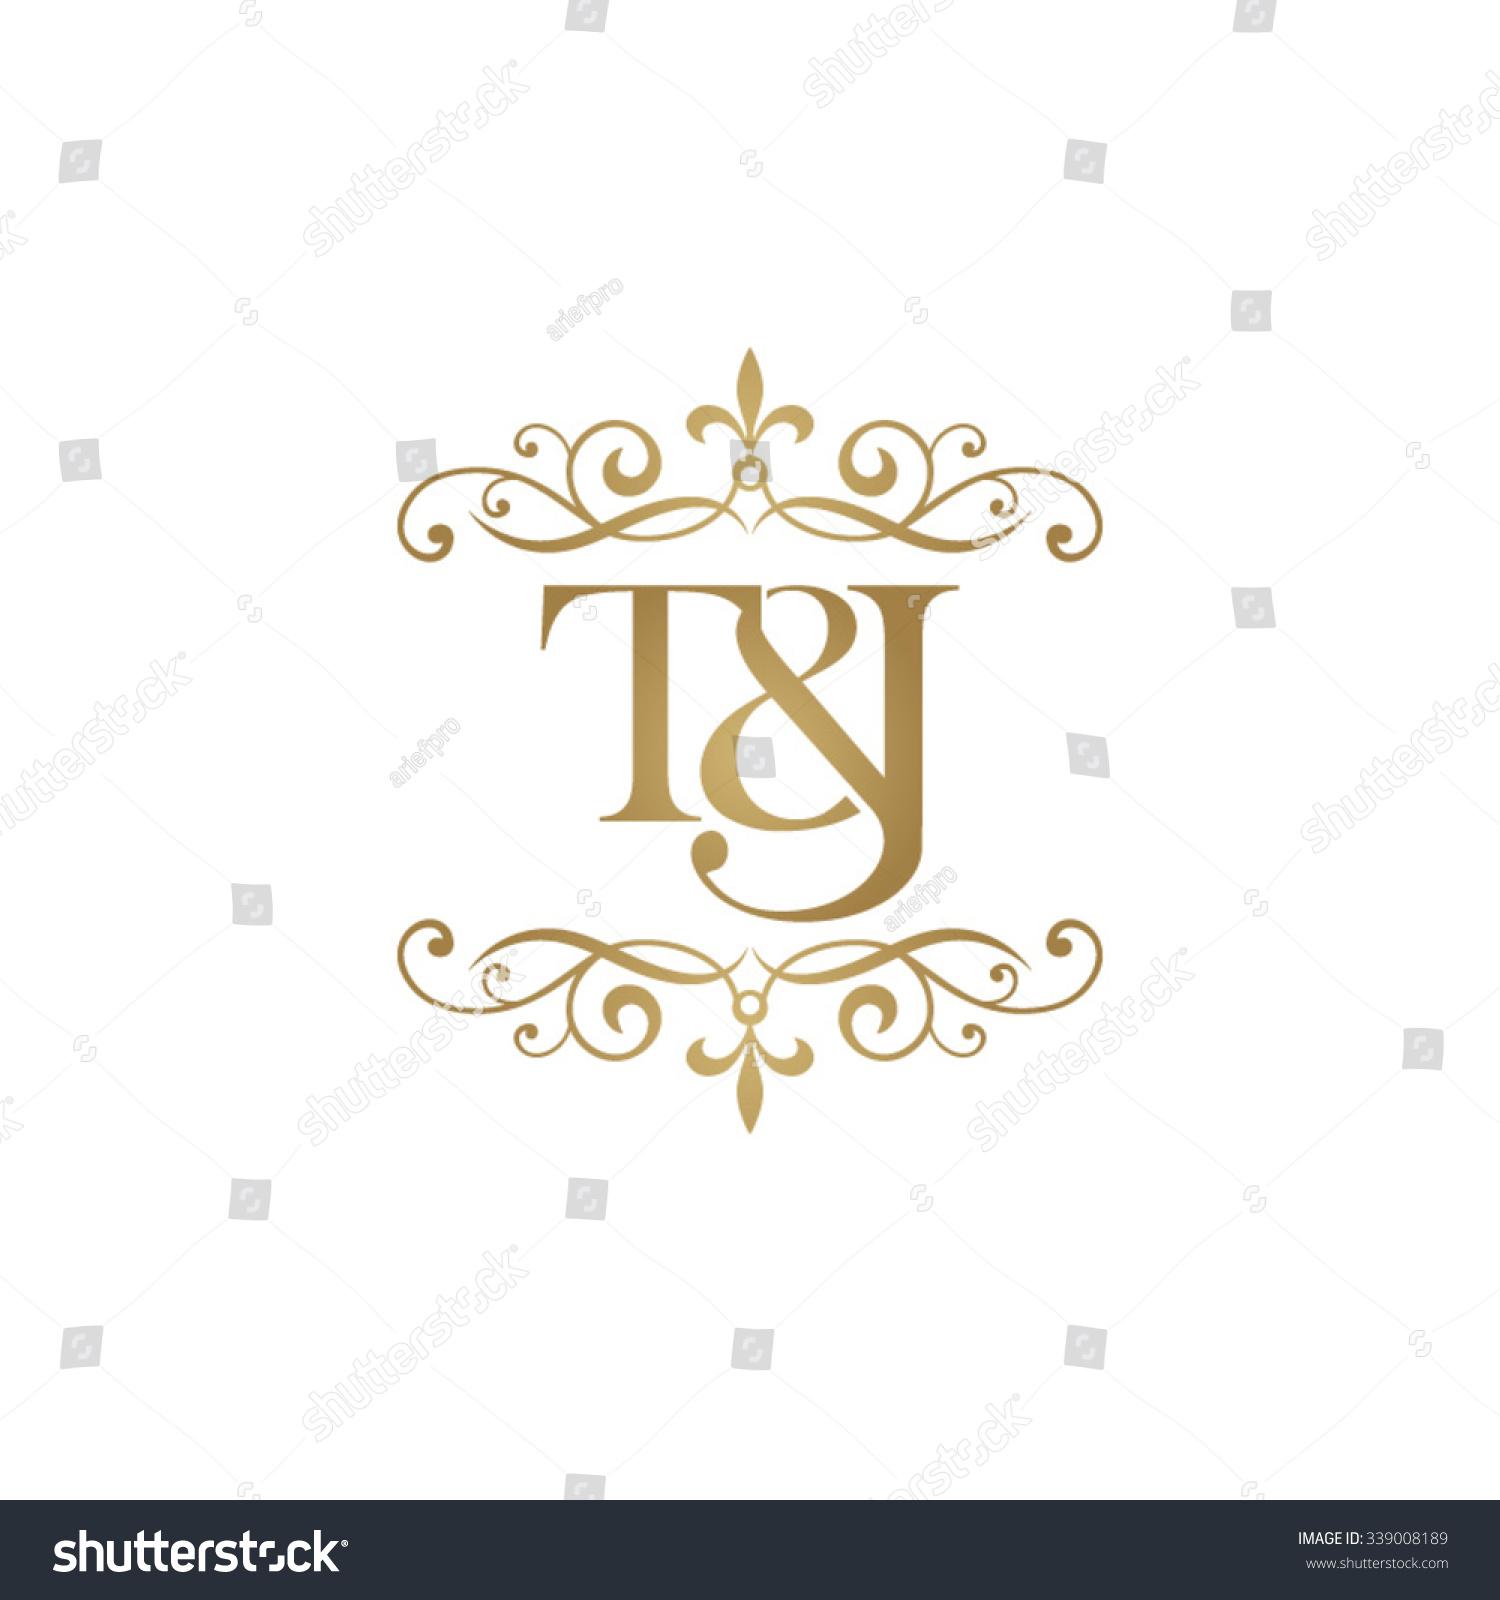 Tj initial luxury ornament monogram logo stock vector - T J Initial Logo Ornament Ampersand Monogram Golden Logo